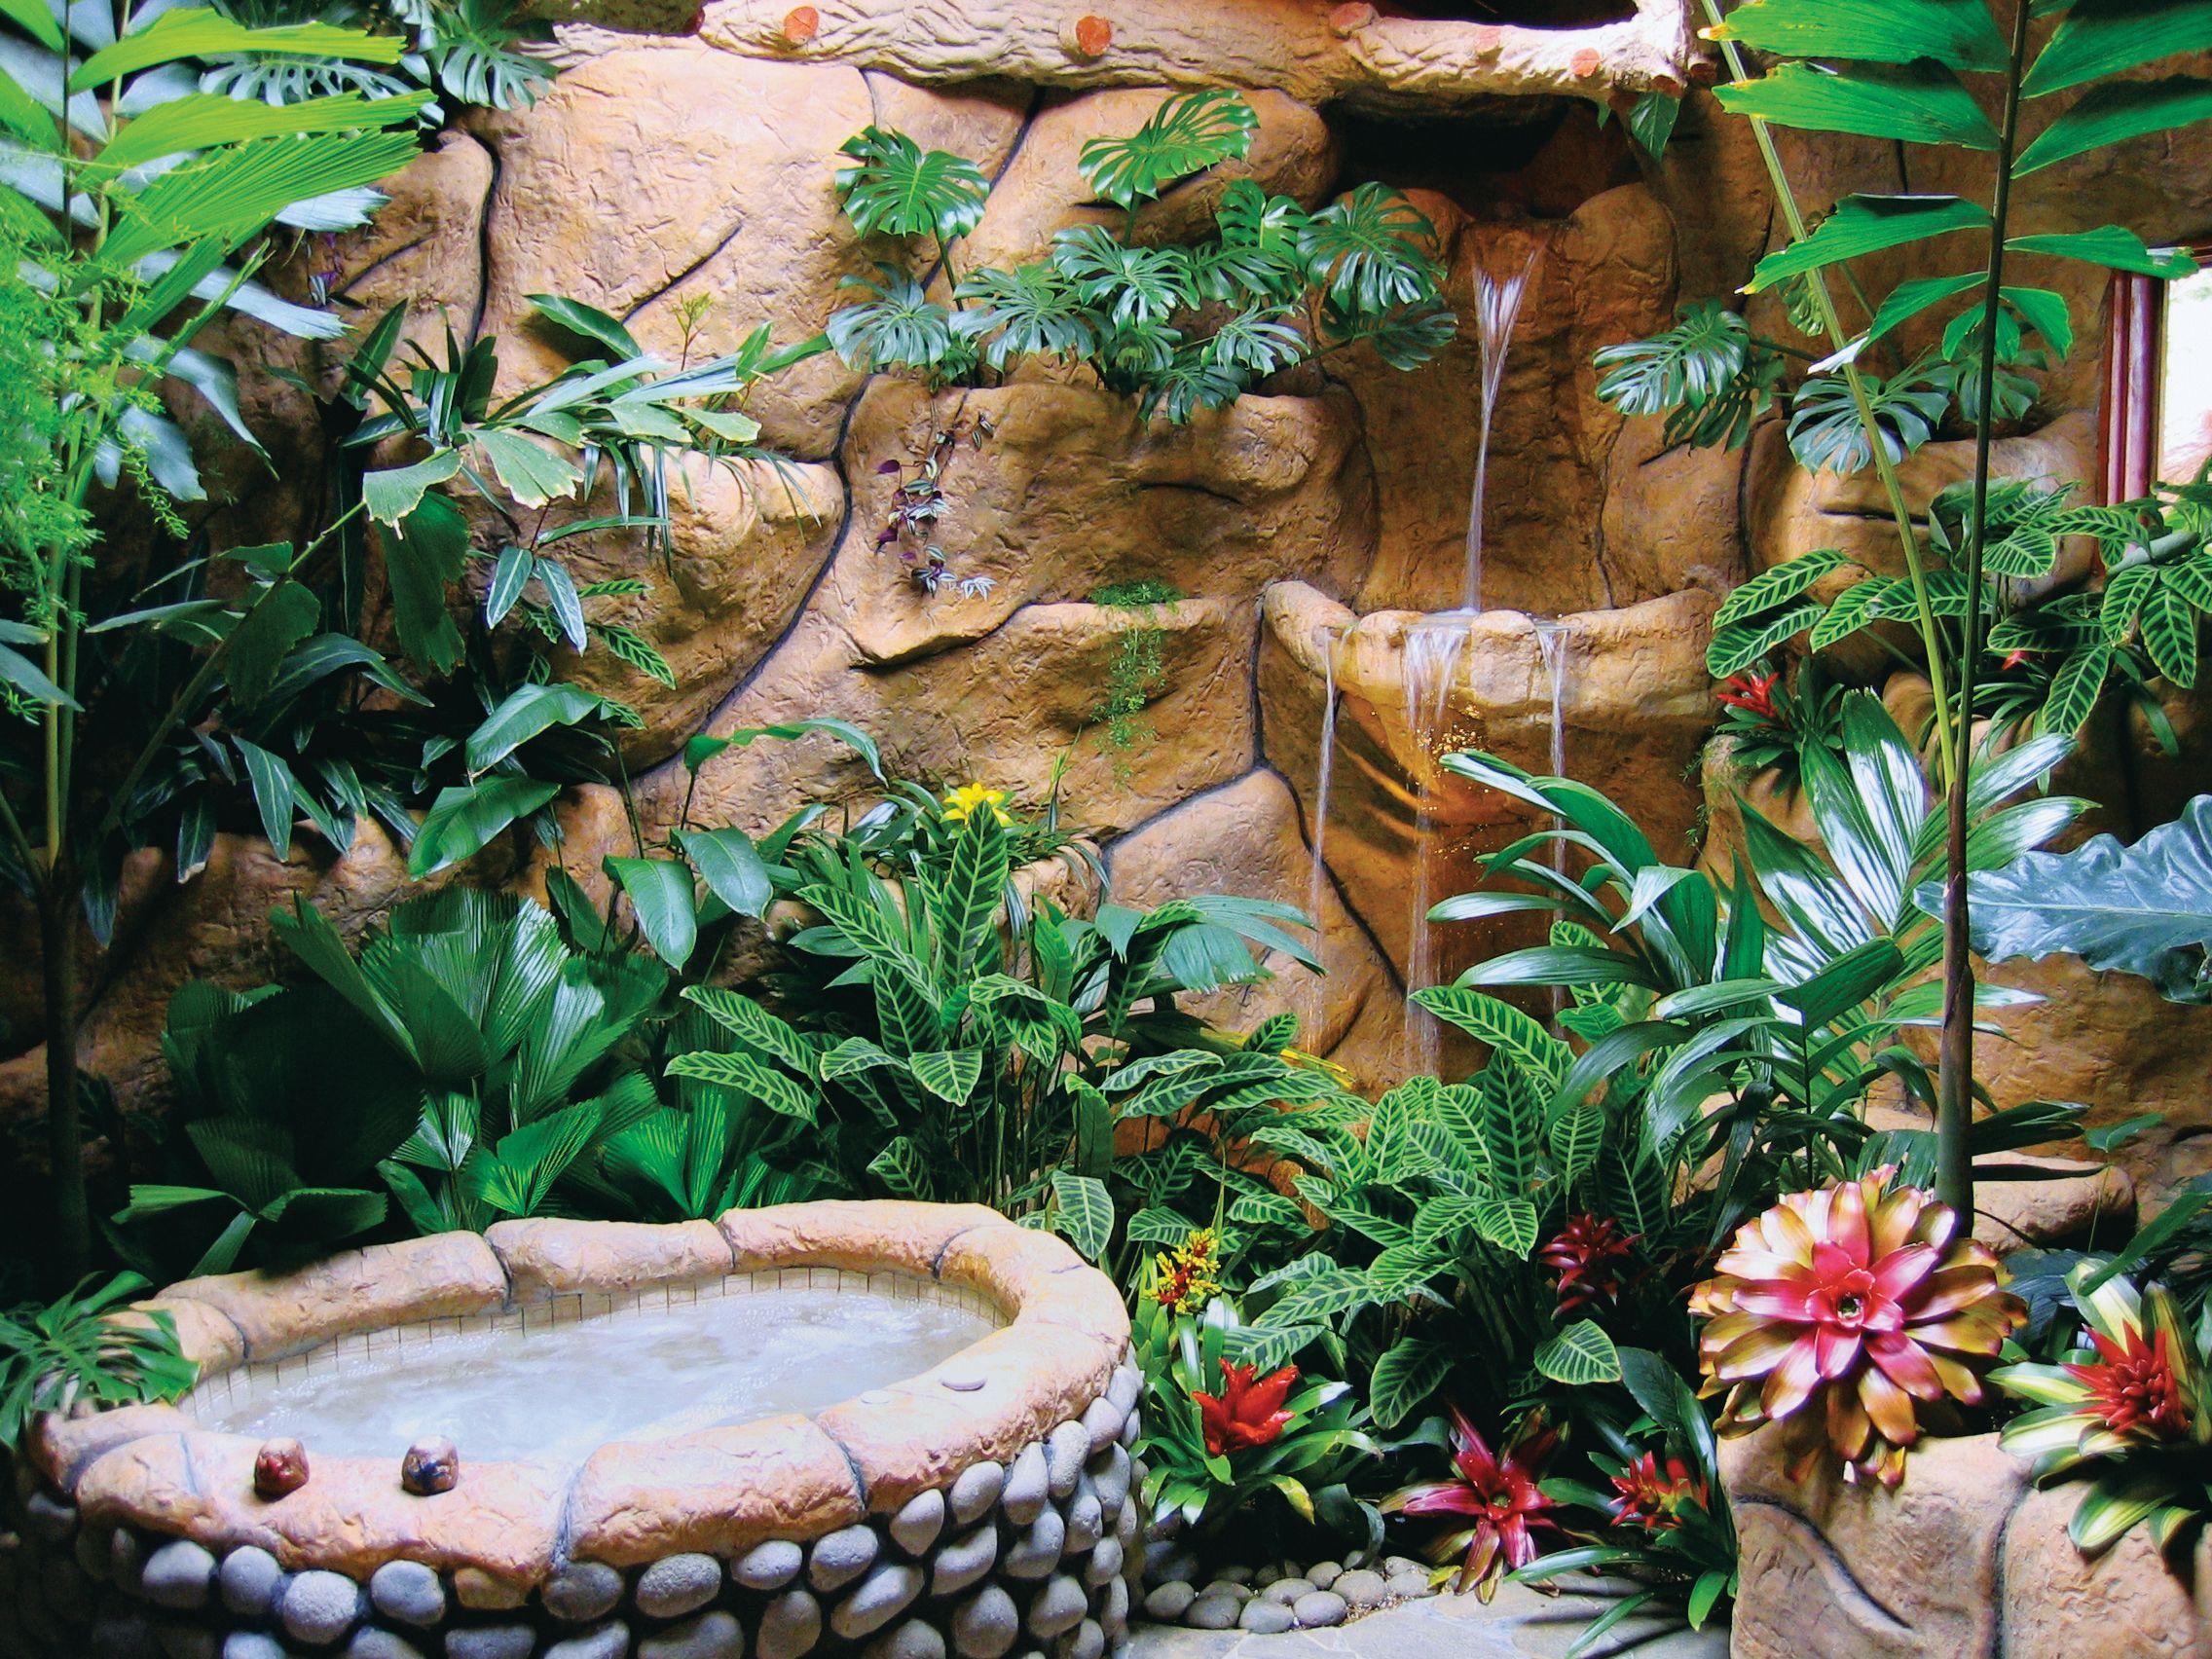 waterfall-gardens-137.jpg